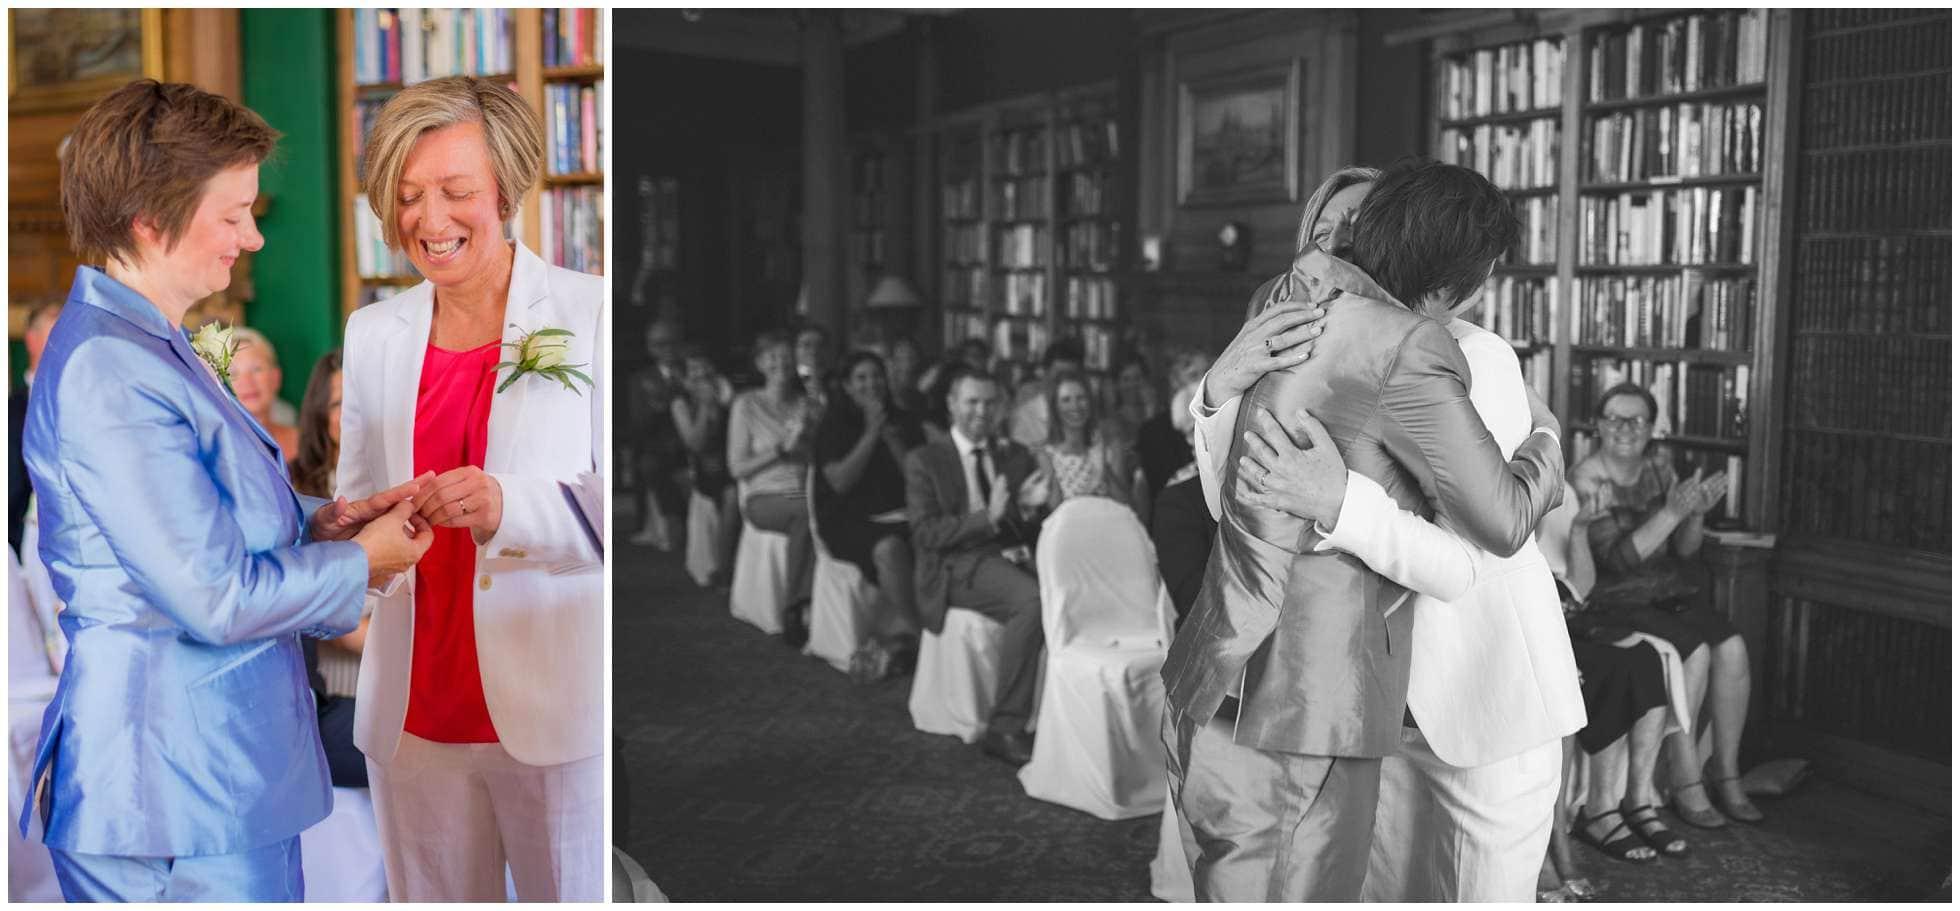 Hugging brides